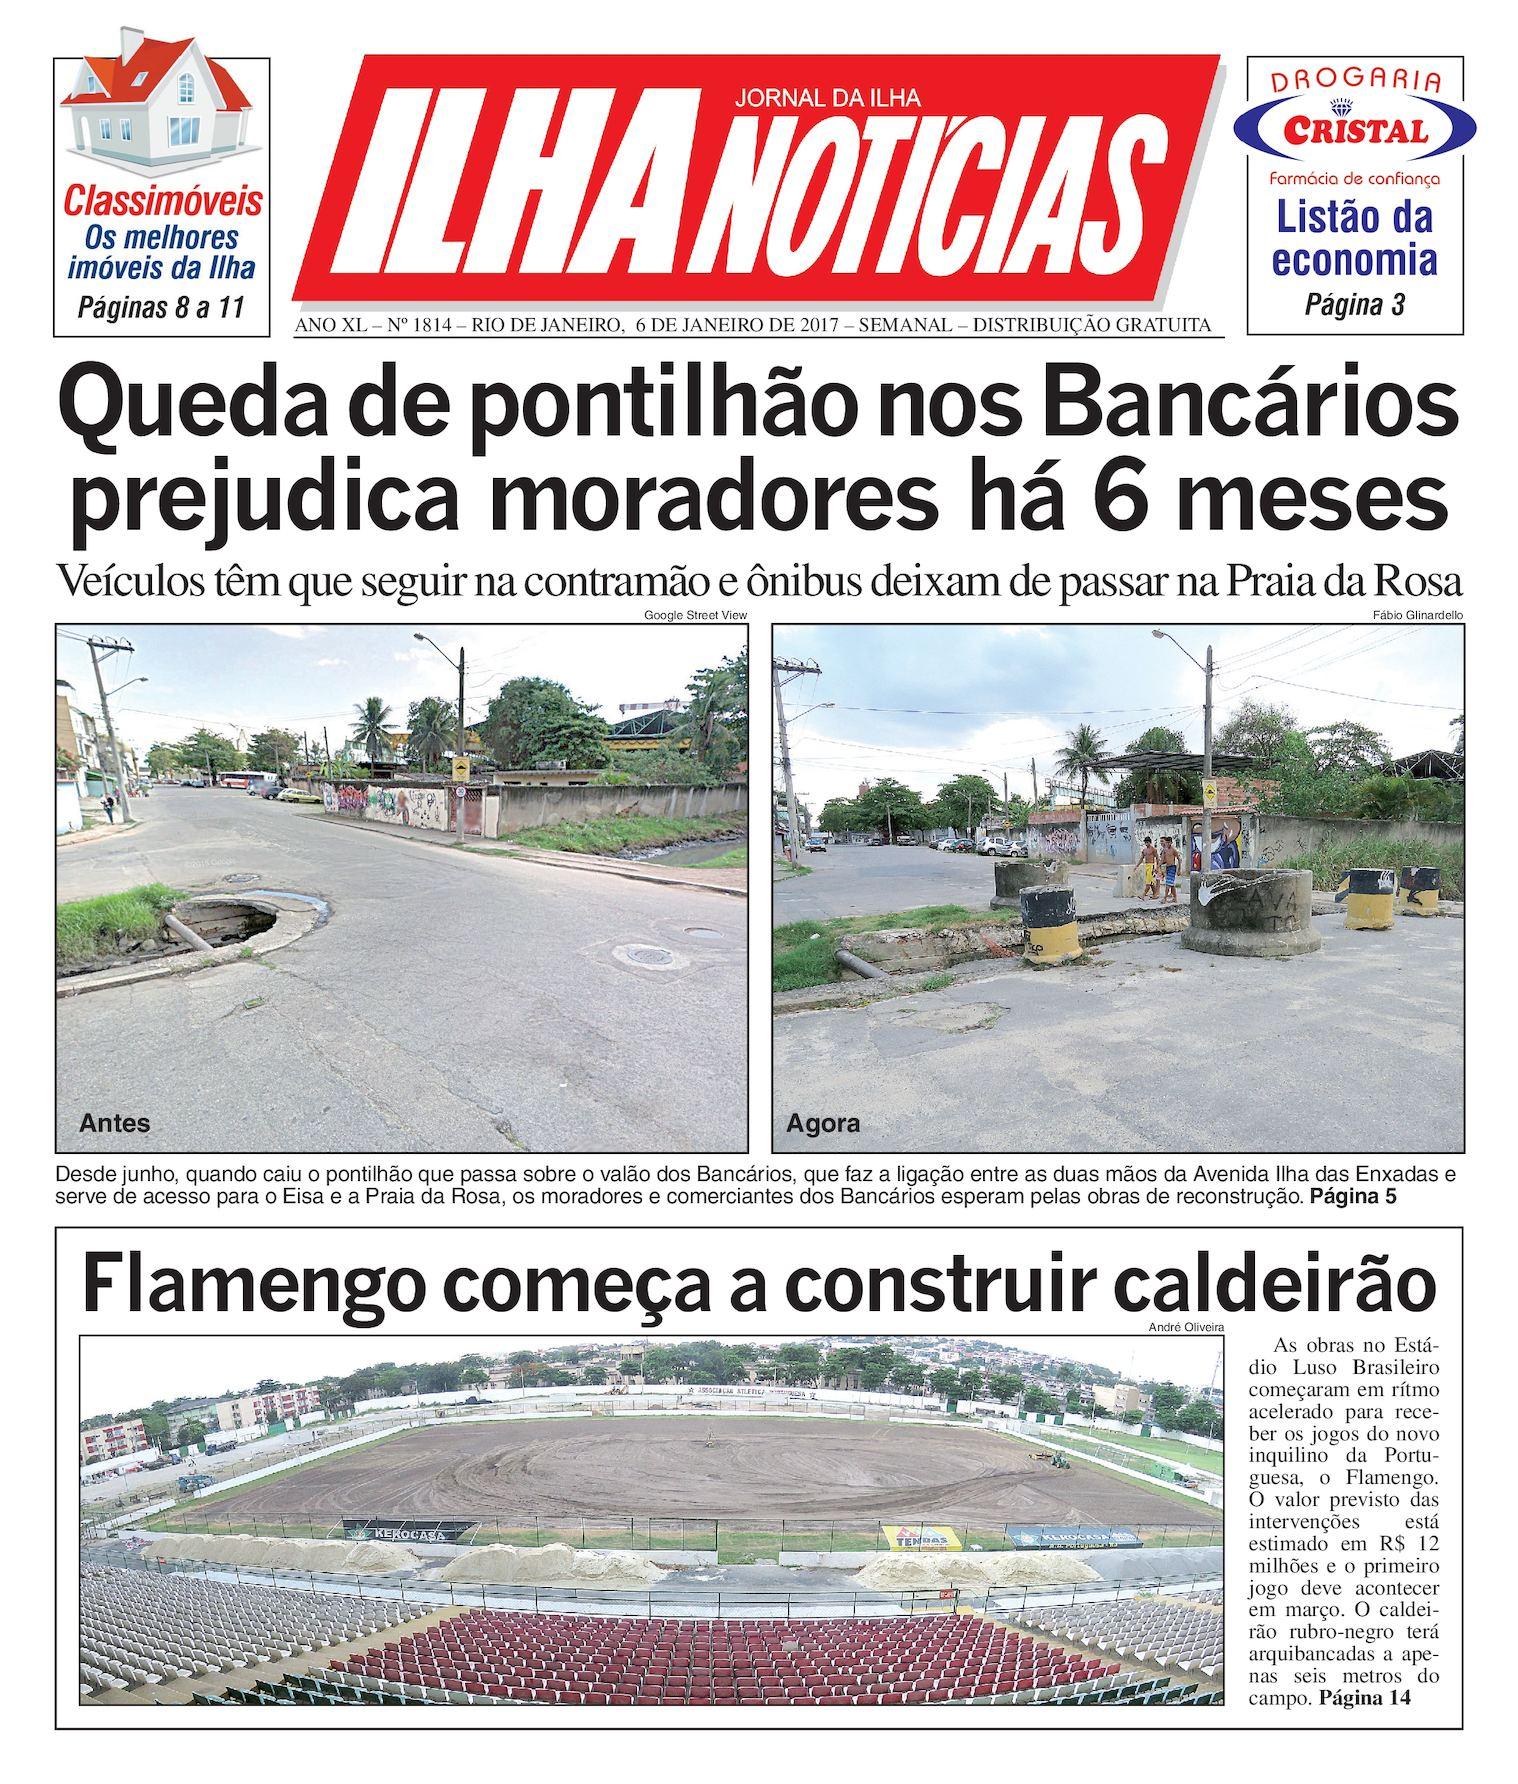 Jornal Ilha Notícias - Edição 1814 - 6/1/2017